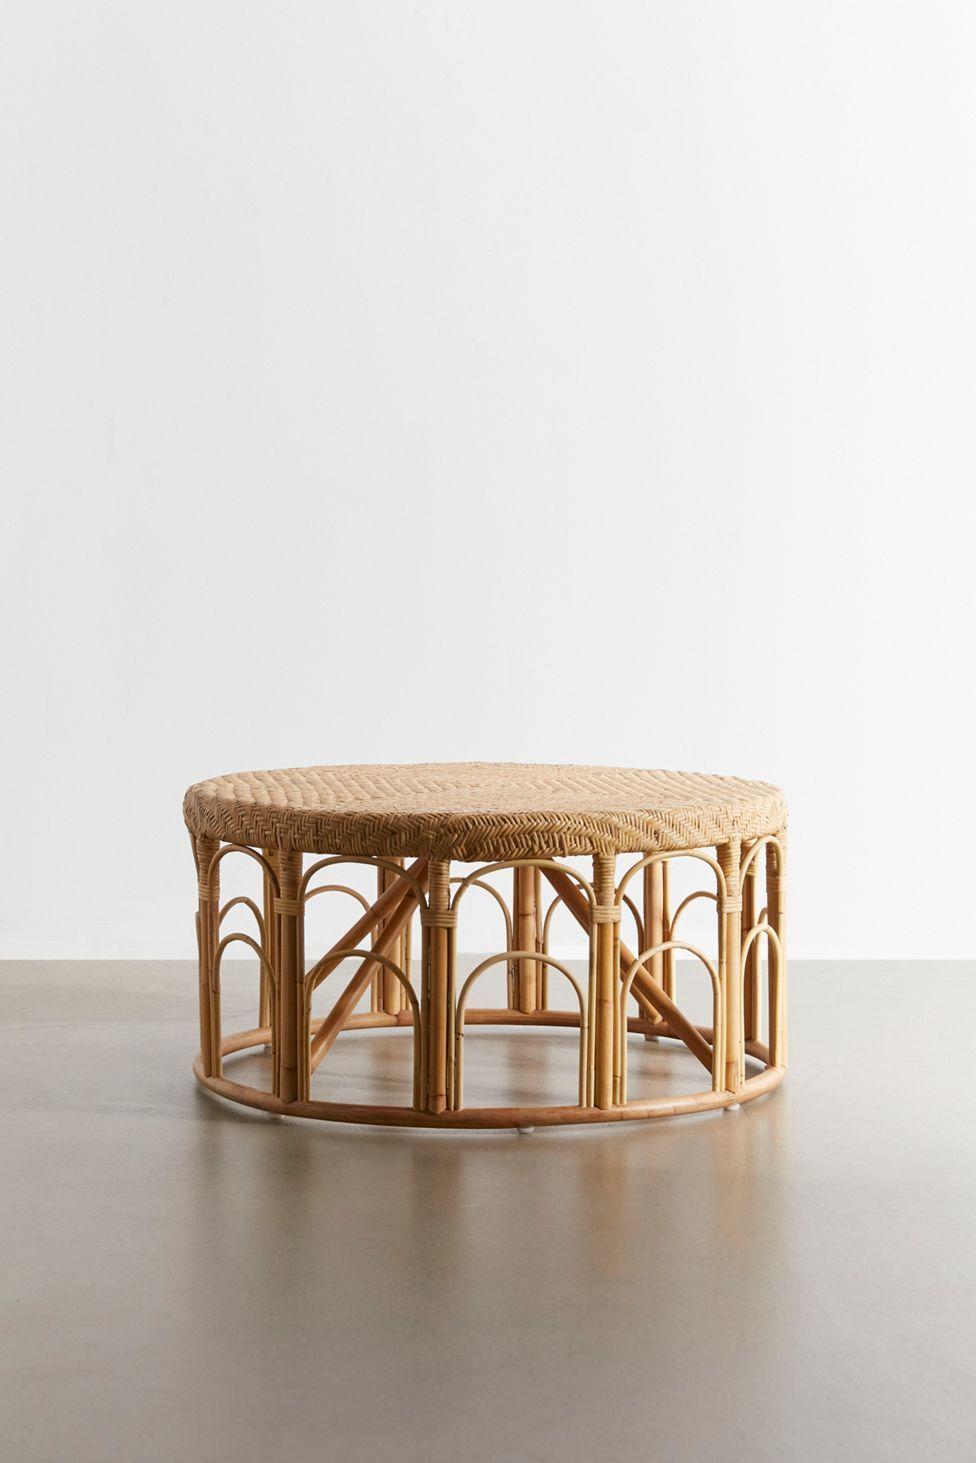 Lulu Rattan Coffee Table Rattan Coffee Table Coffee Table Urban Outfitters Wicker Coffee Table [ 1463 x 976 Pixel ]